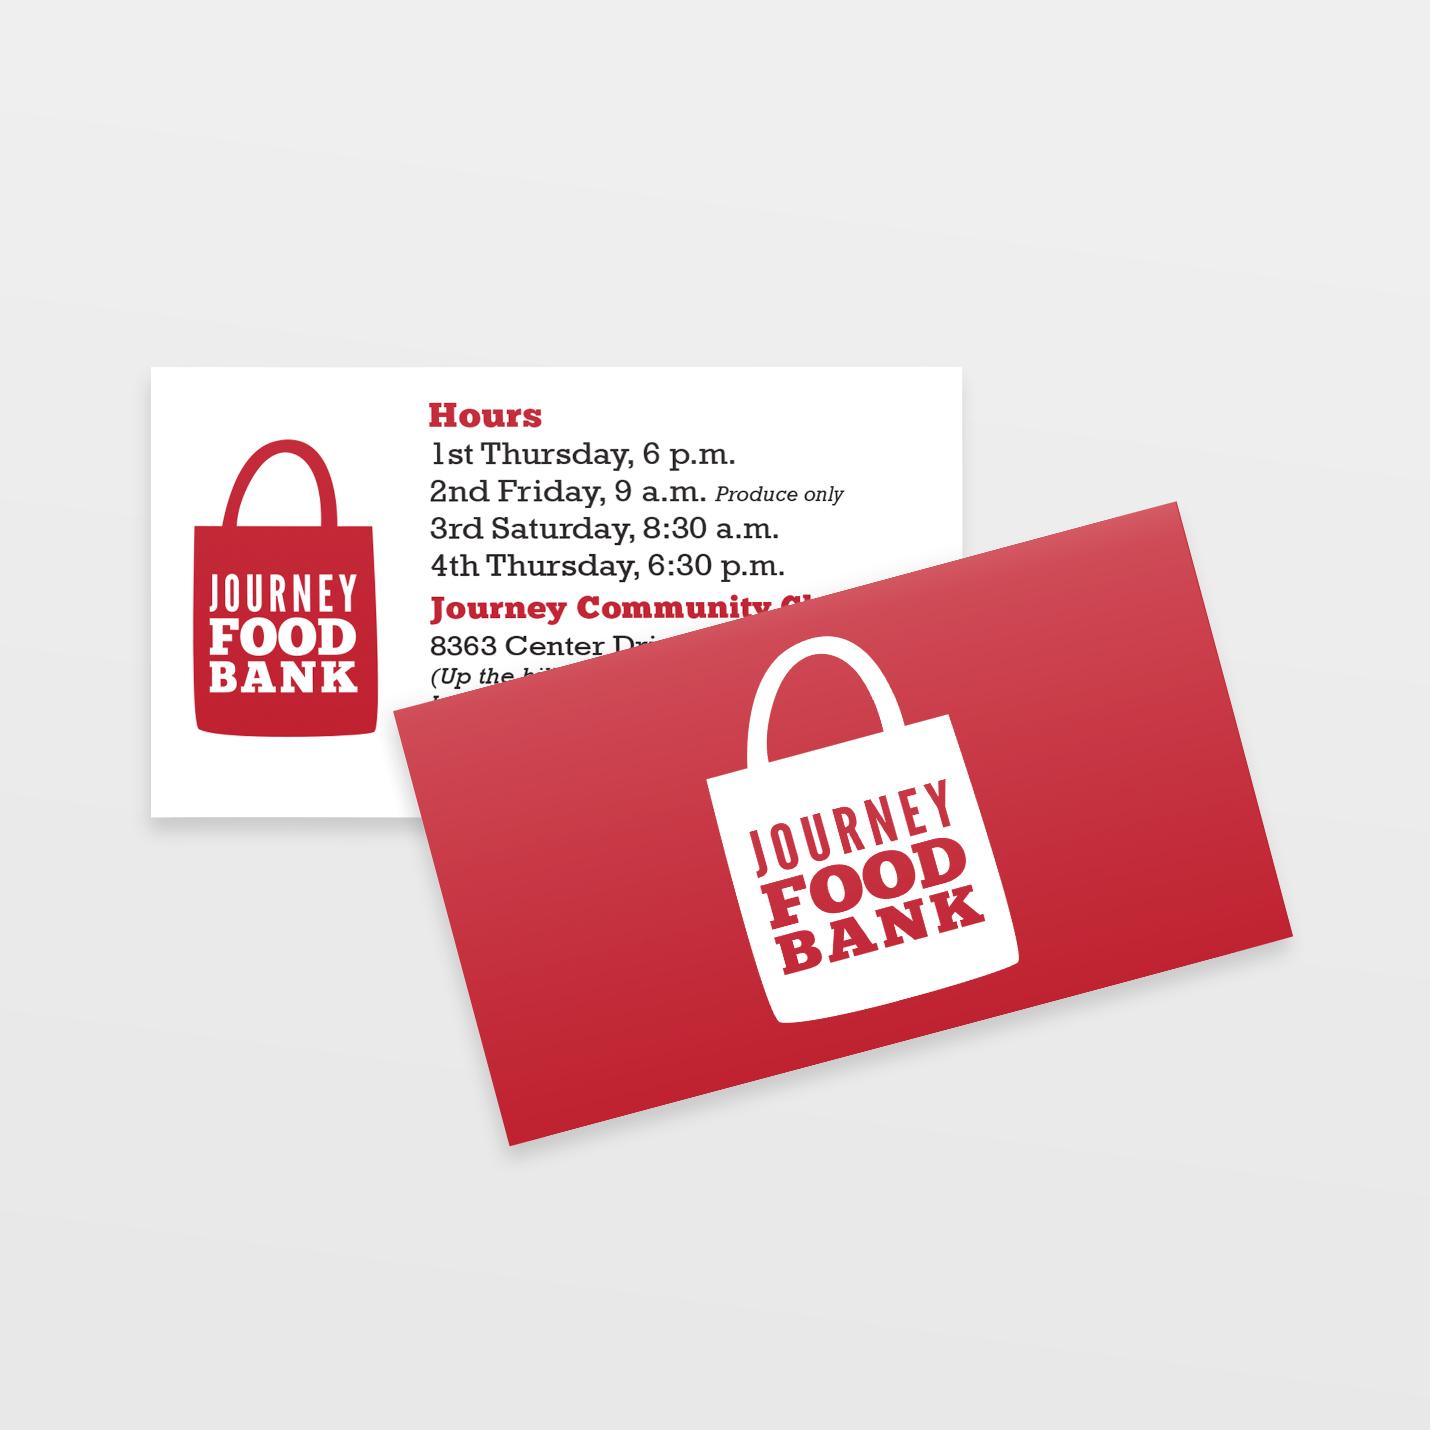 Business-Card-Mockup-food-bank.jpg